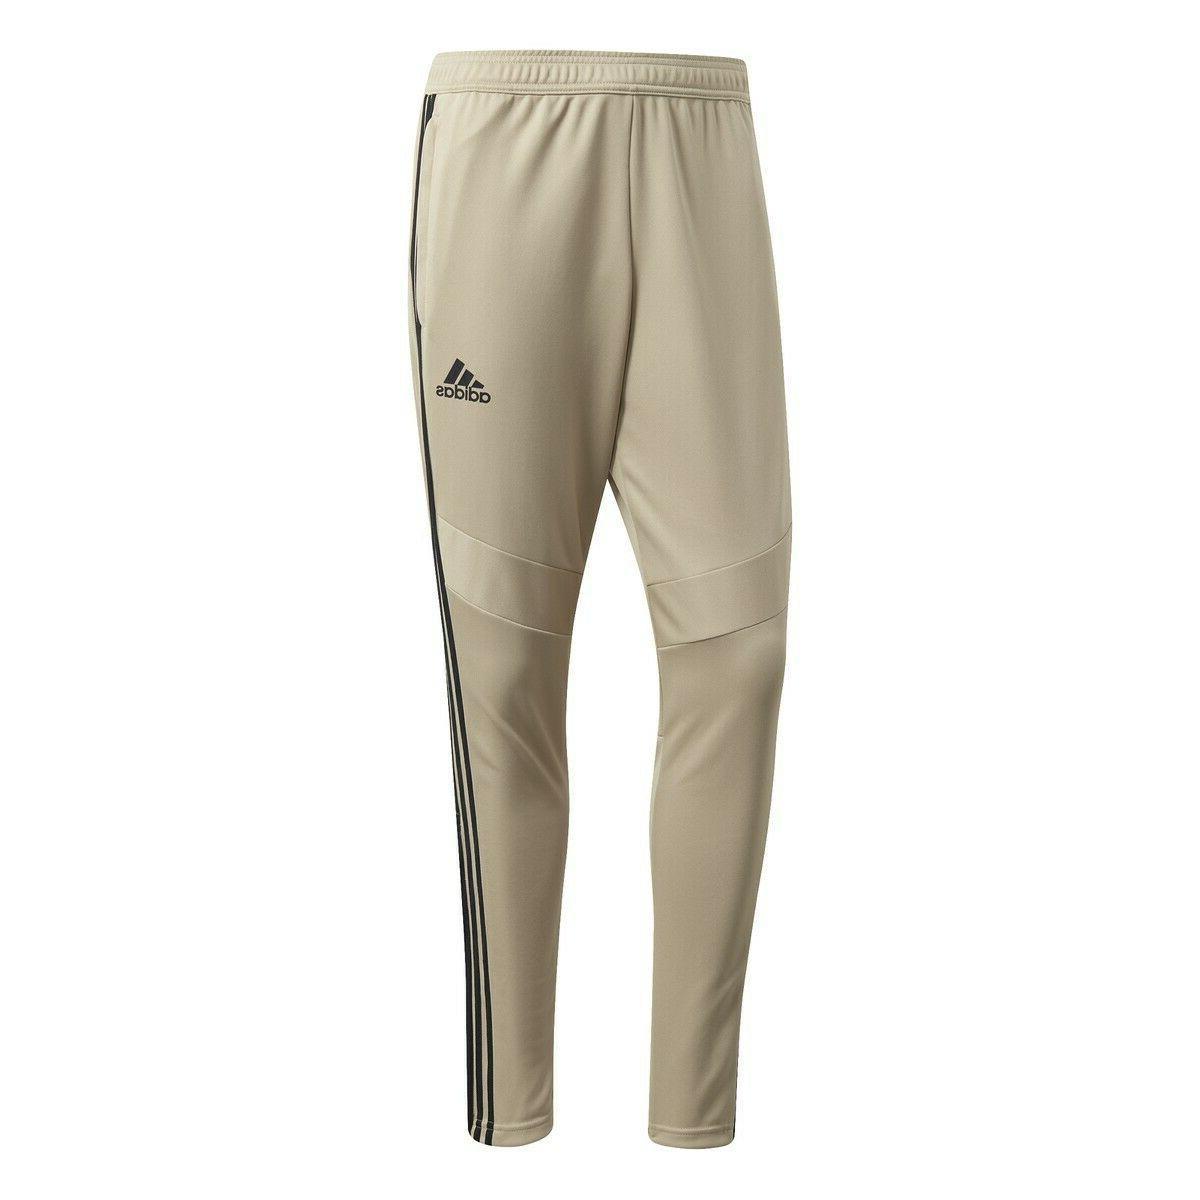 Adidas Men's Athletic Training Climacool